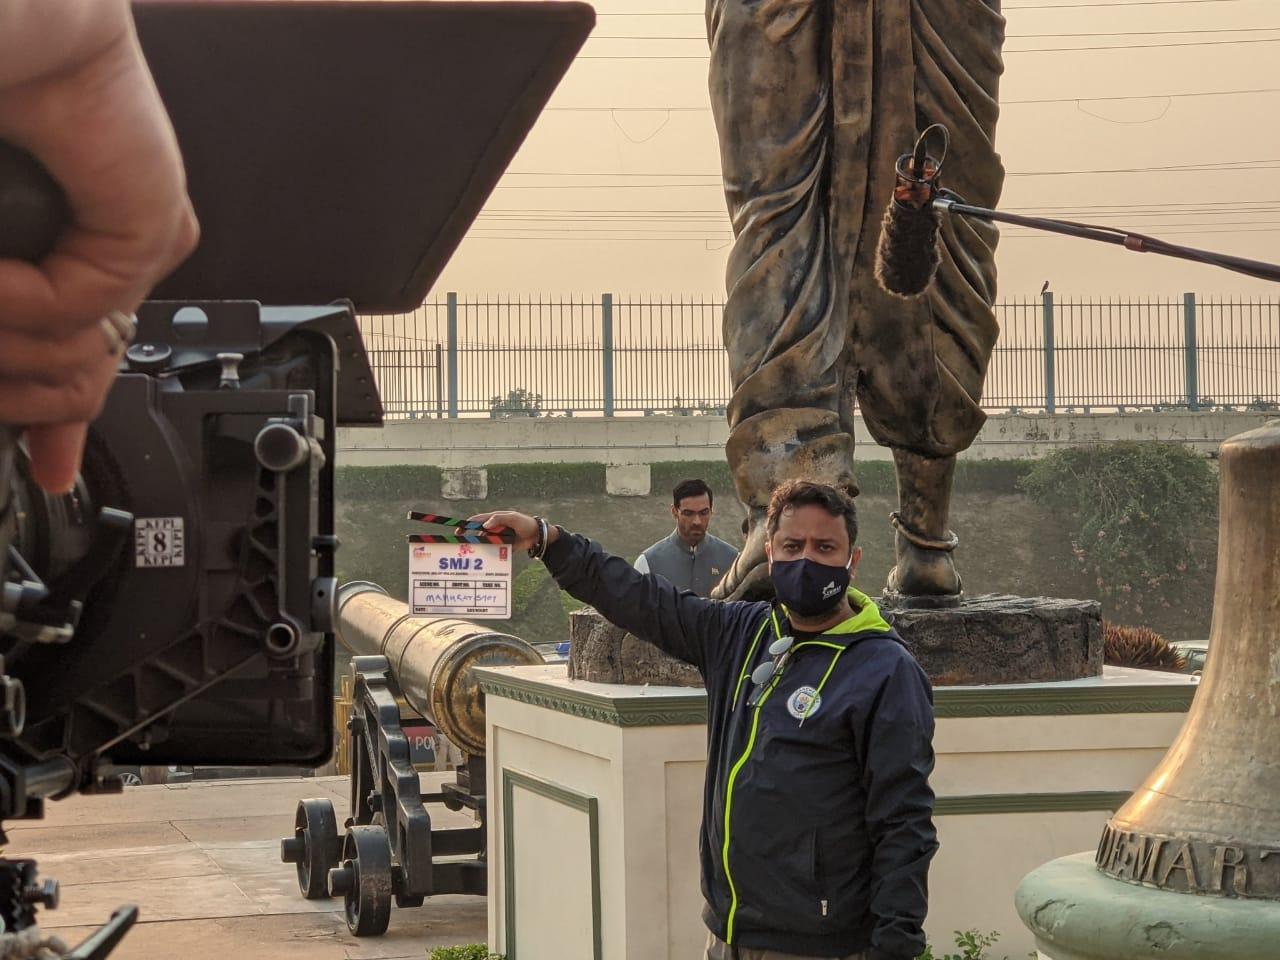 John Abraham Divya Khosla Kumar kick start shooting of Satyameva Jayate 2  -ANI - BW Businessworld